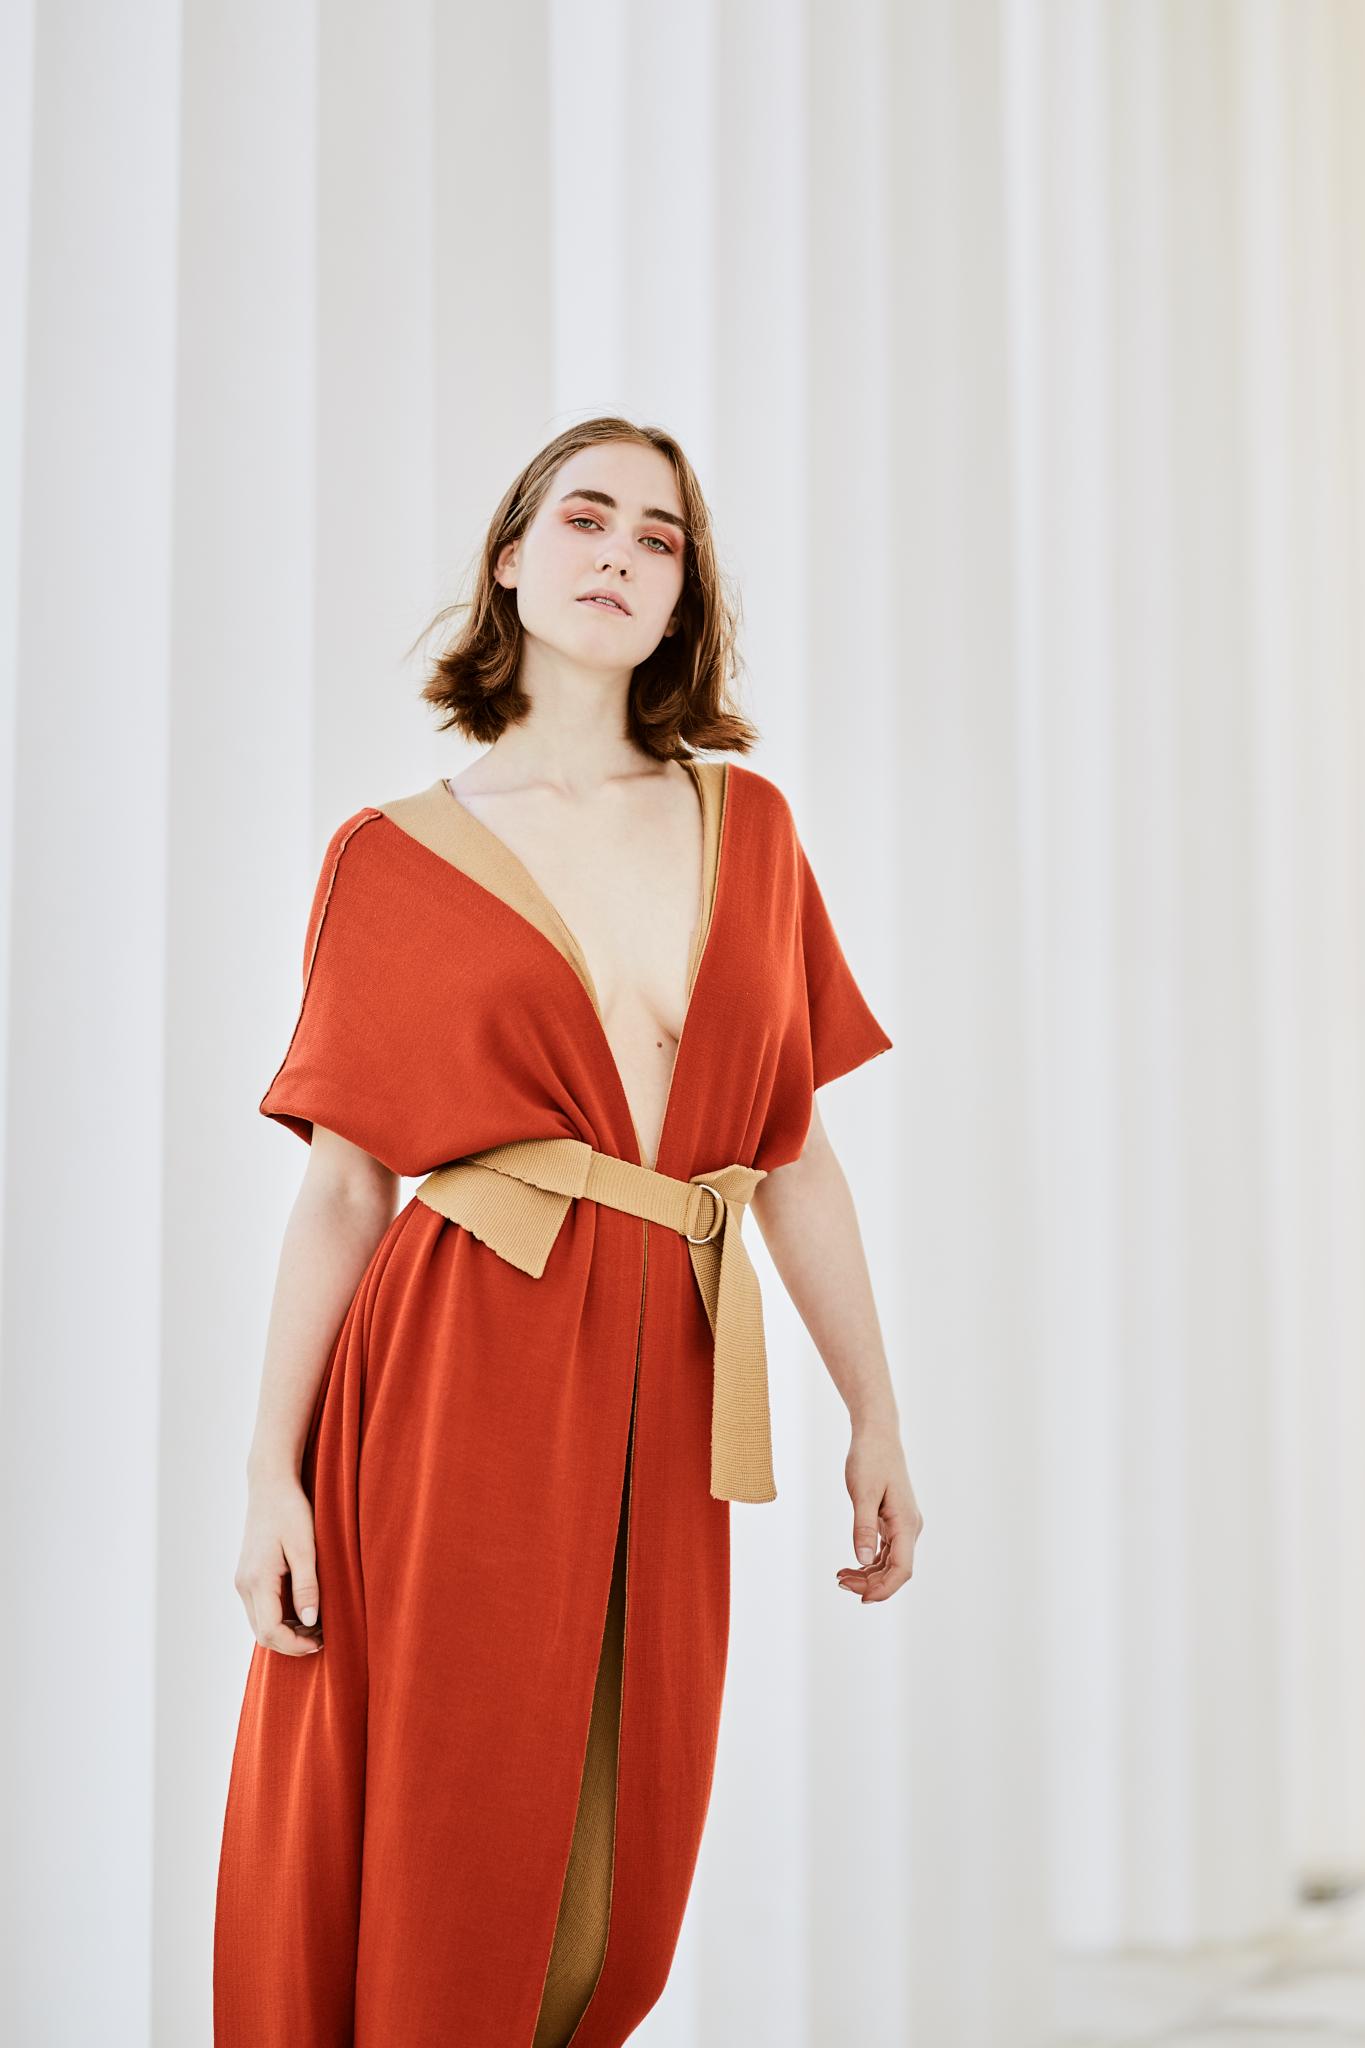 Red Dresses_03.jpg